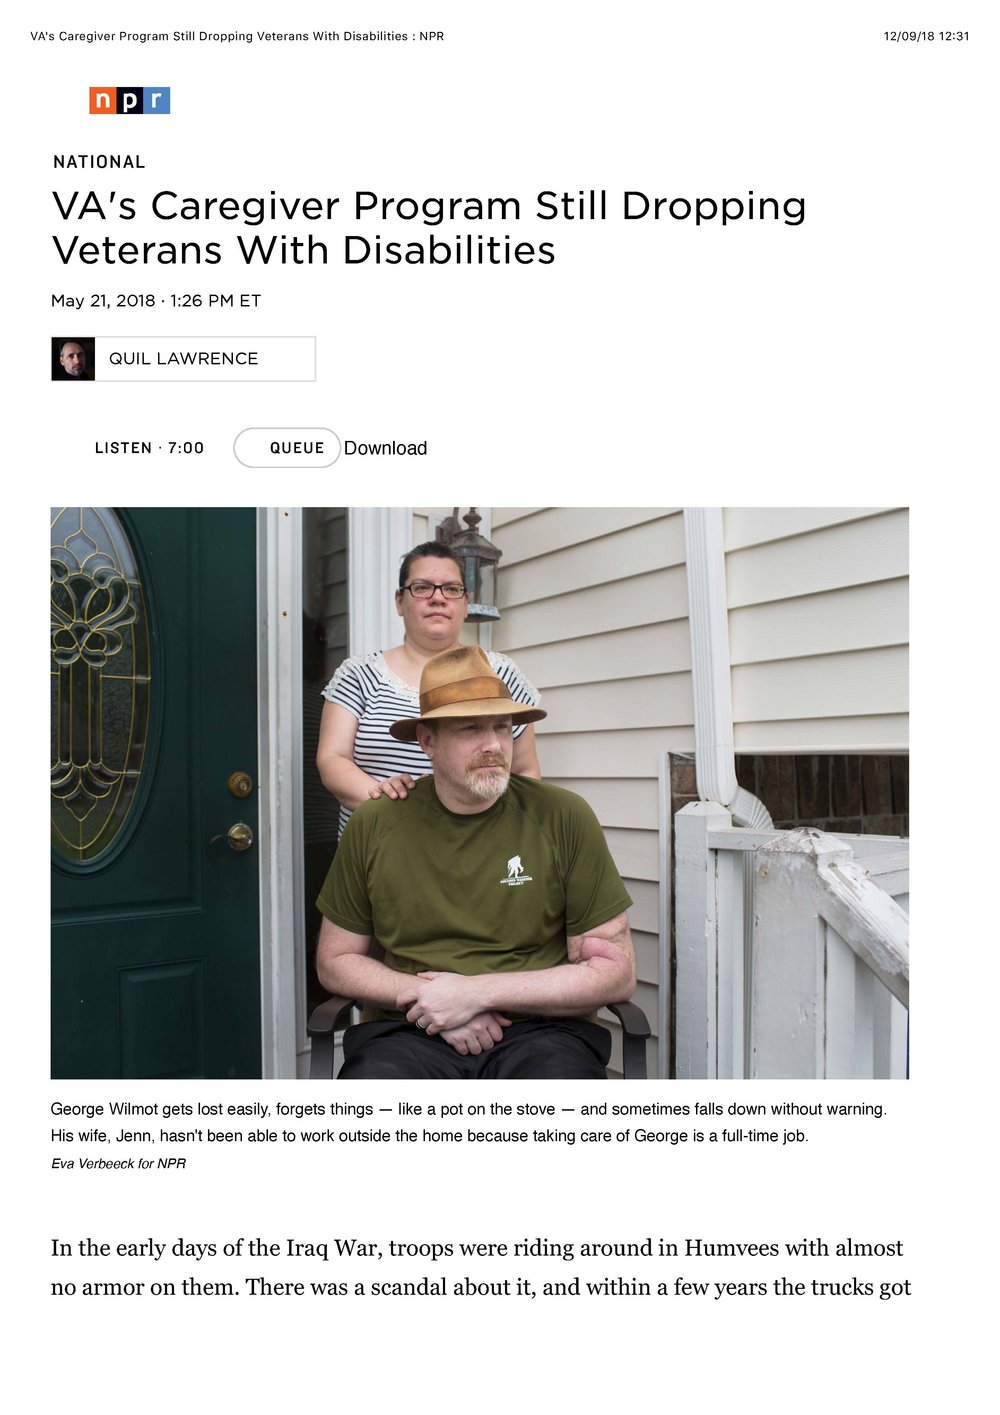 NPR, United States of America